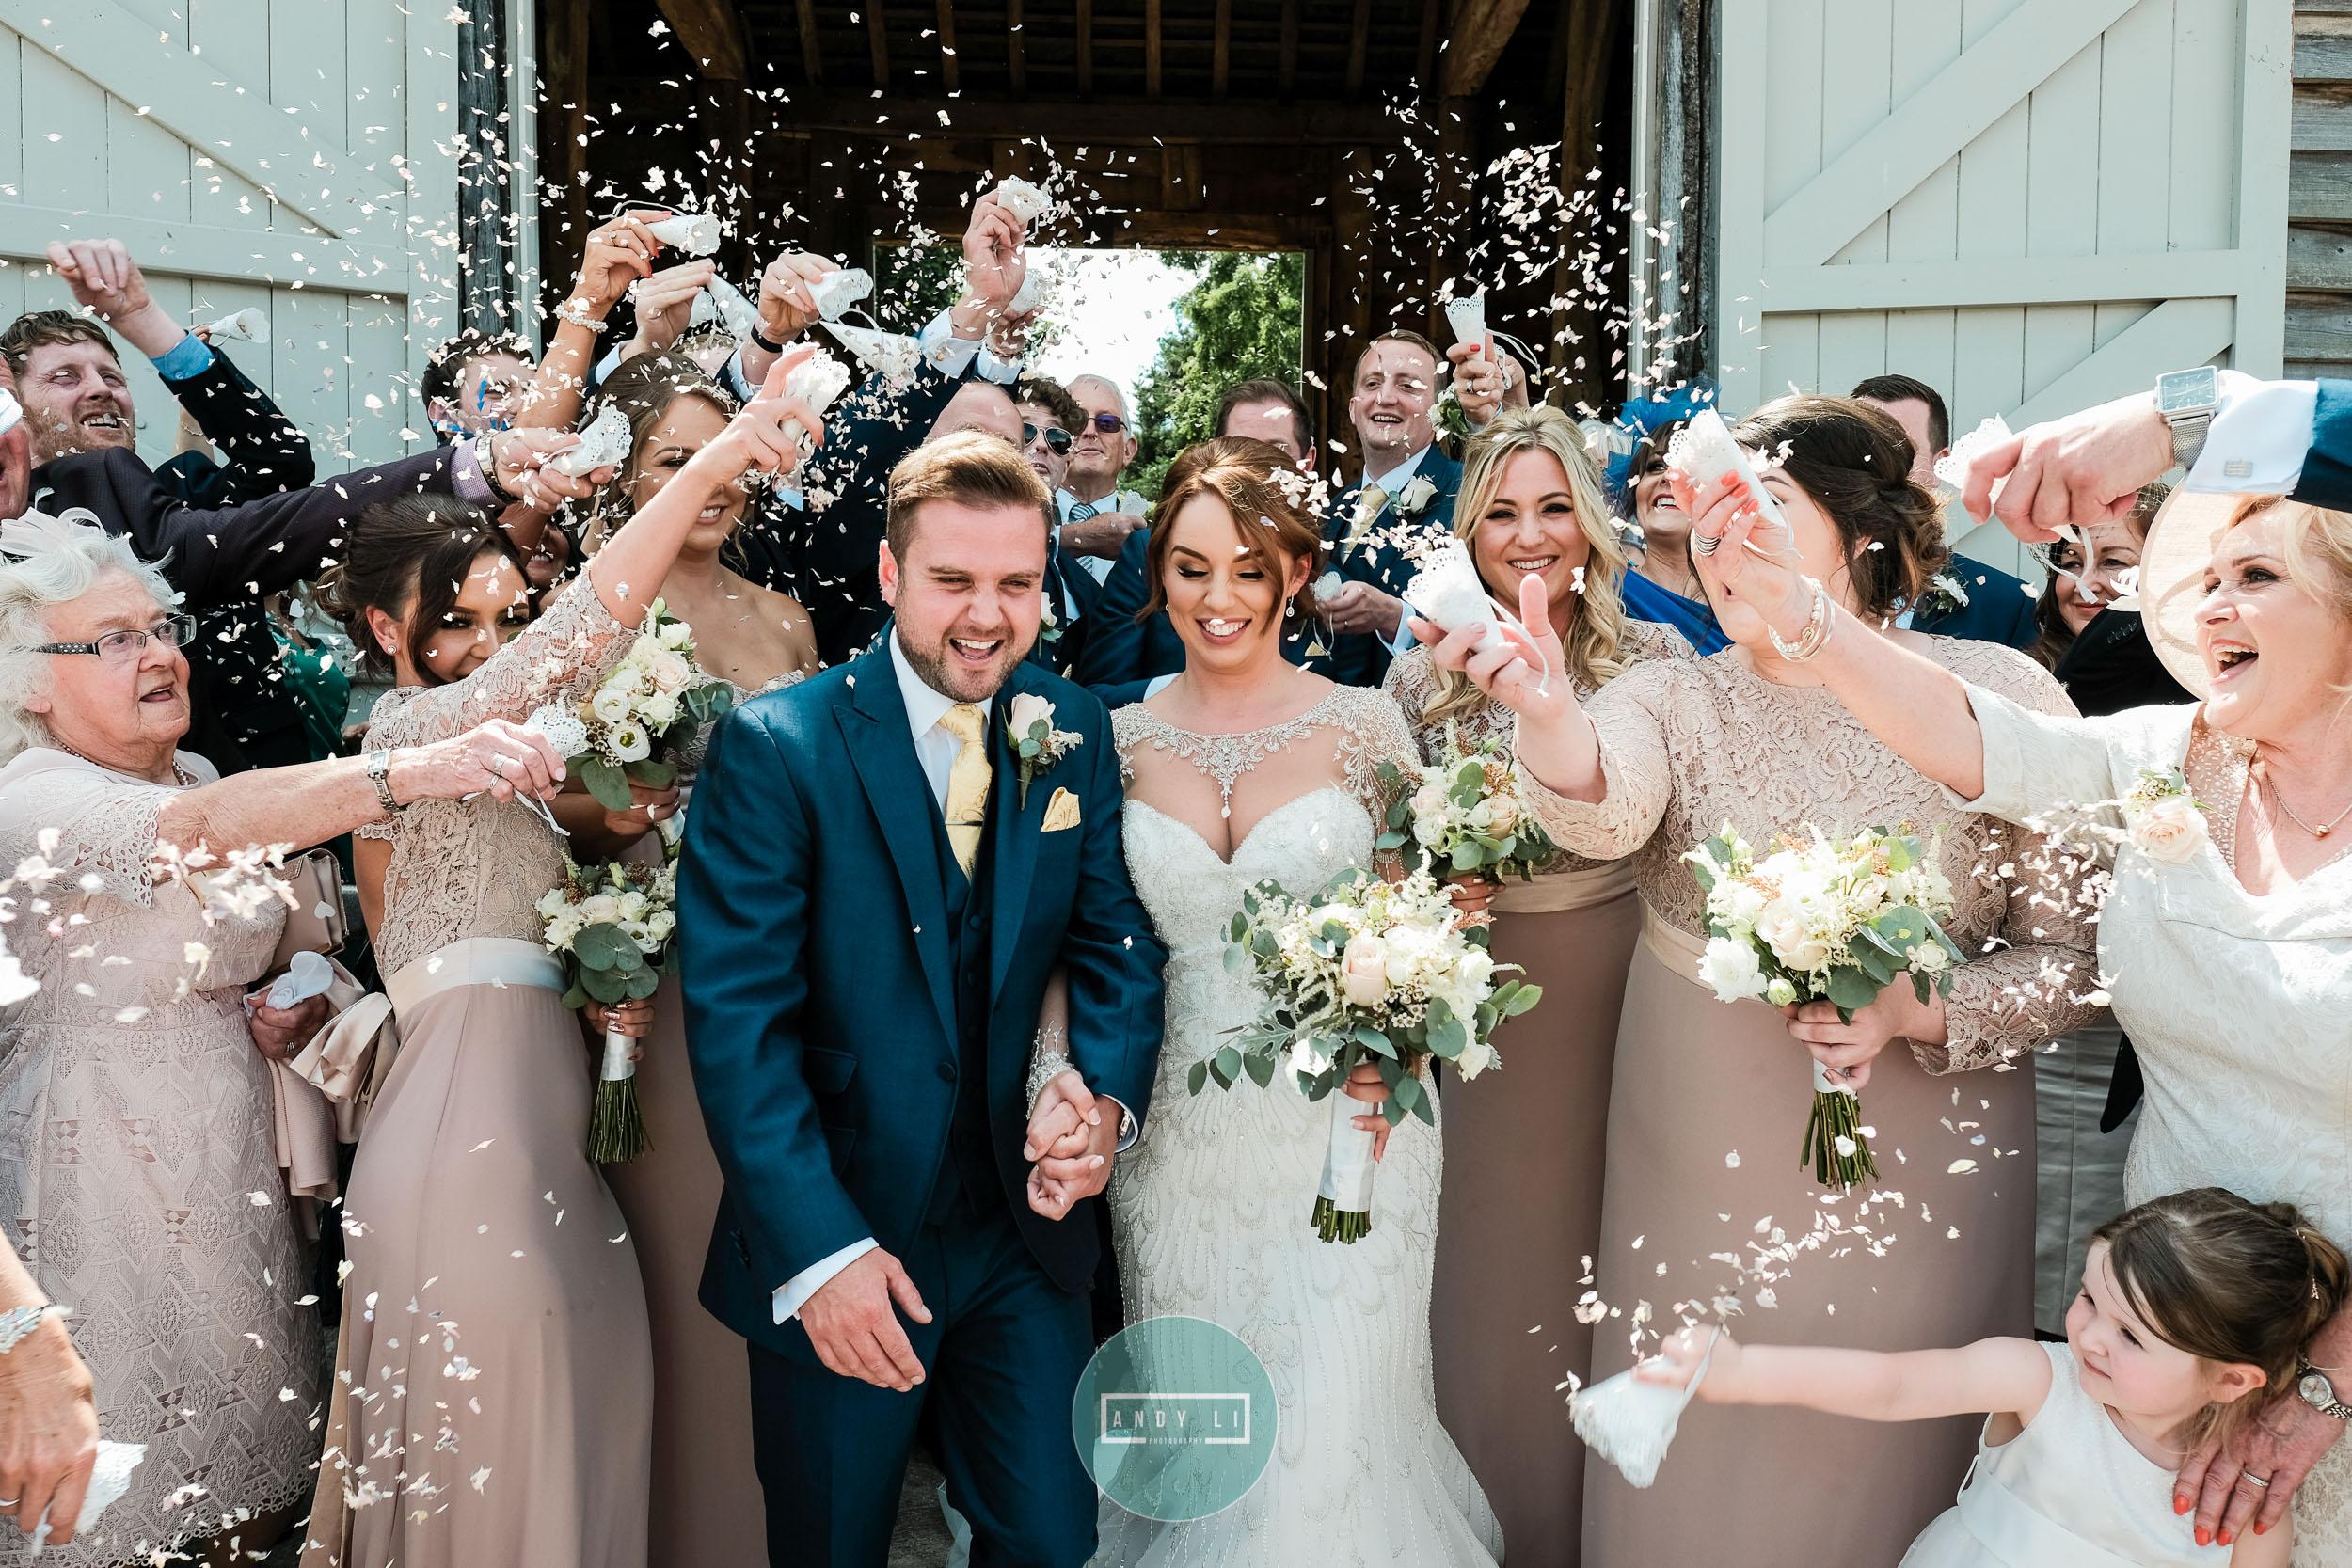 Pimhill Barn Wedding Photographer-069-XPRO6170.jpg